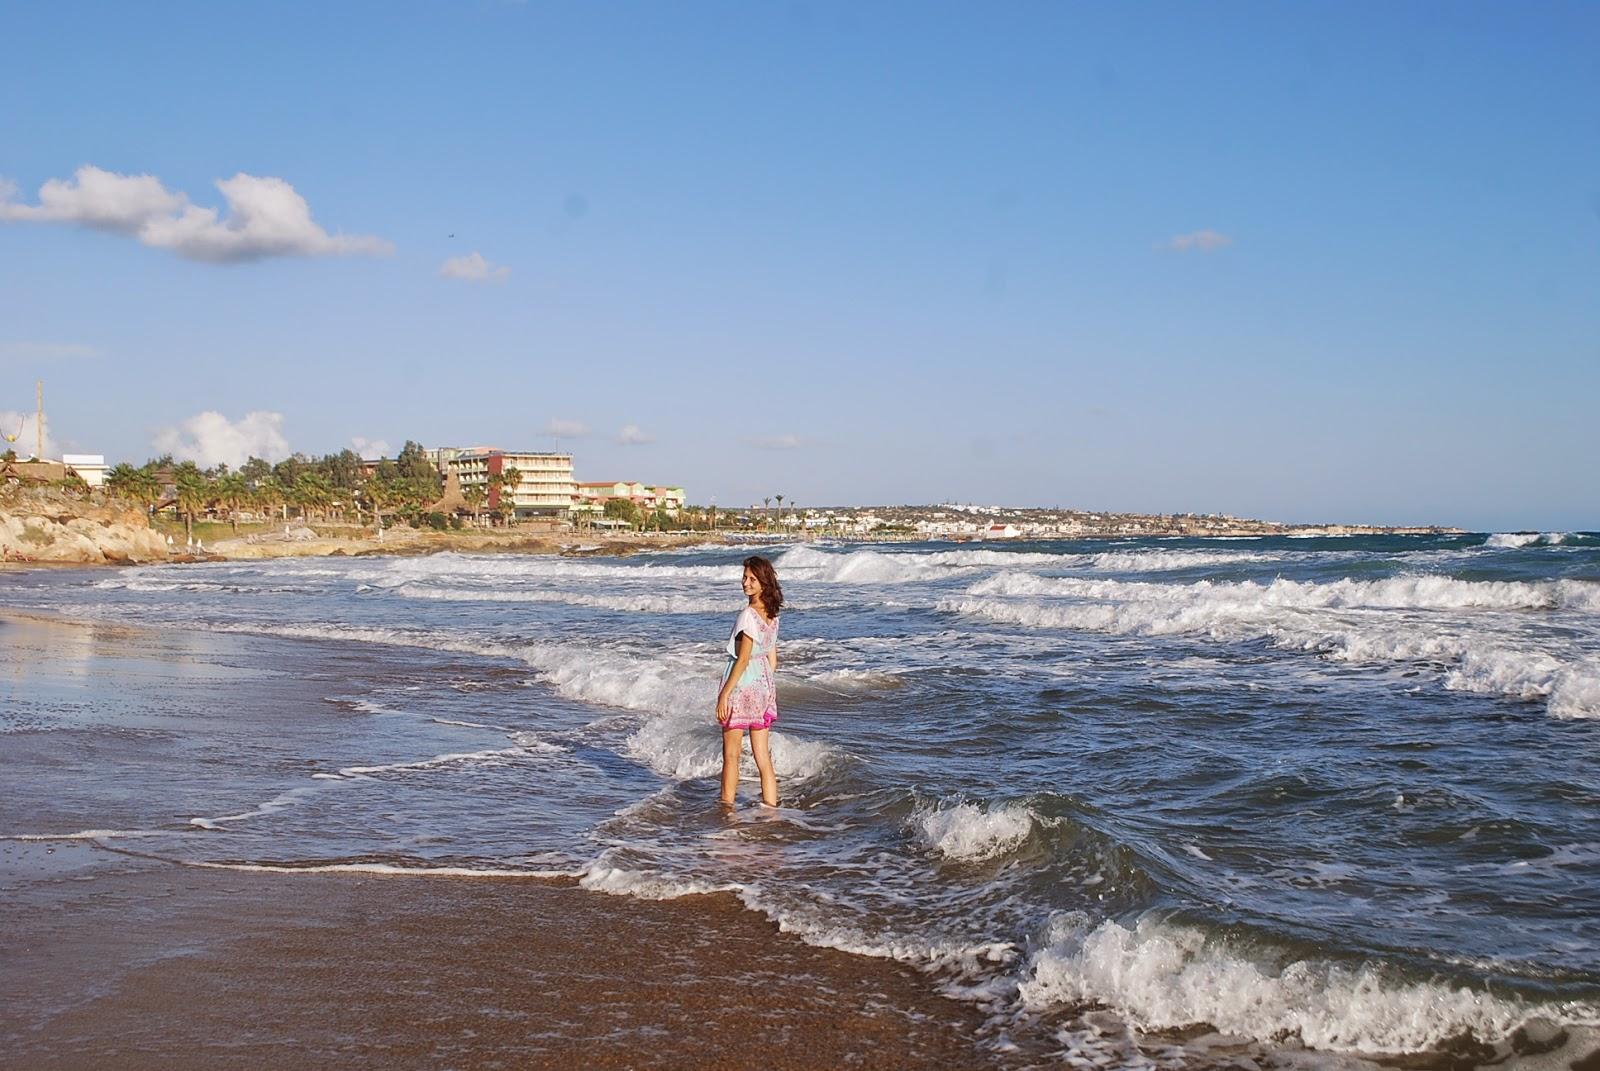 Meltemi beach, Chersonisos (Hersonissos), Crete, Greece. Пляж Мелтеми, Херсонисос, Крит, Греция.